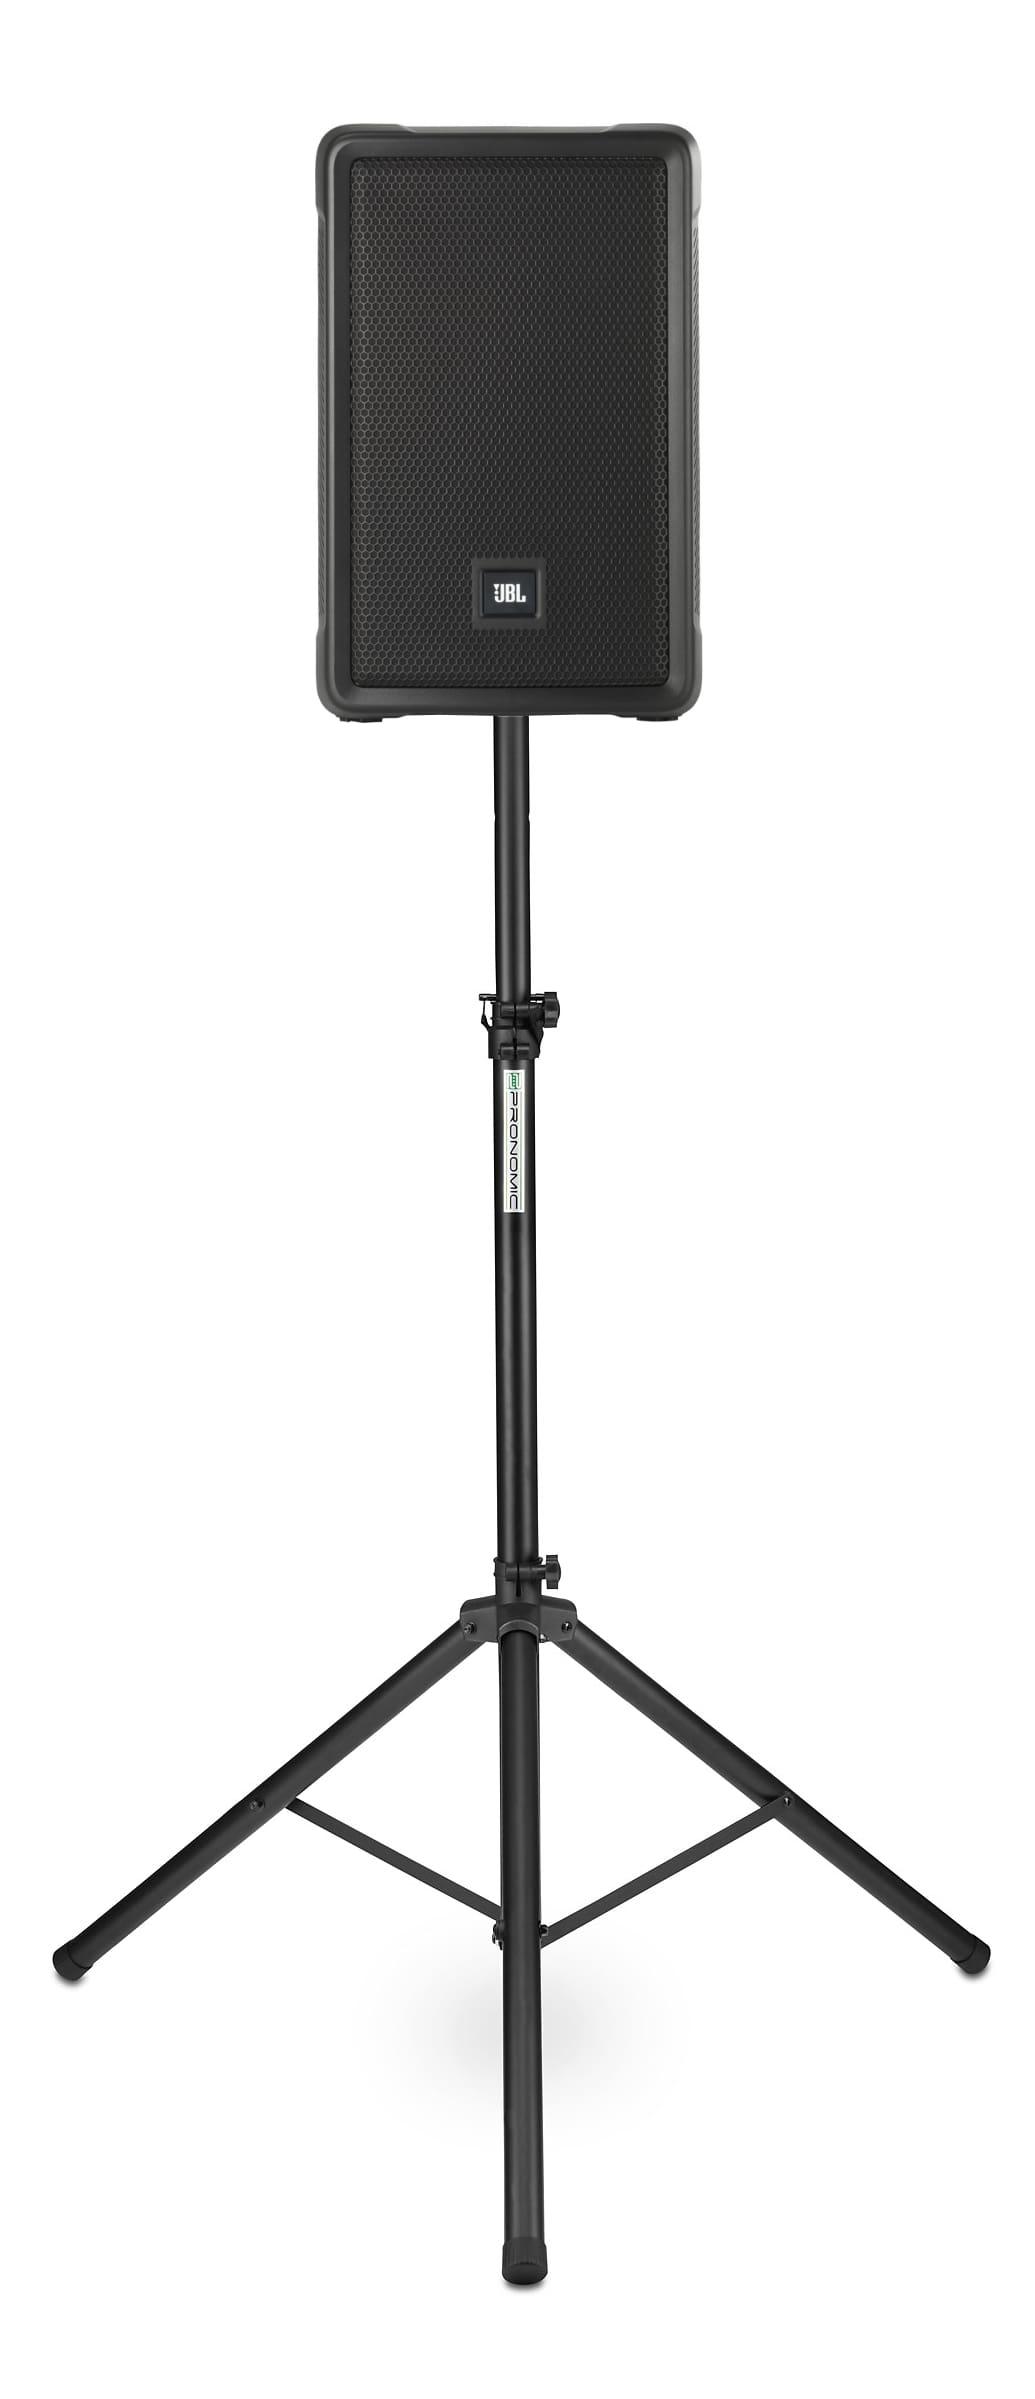 Paboxen - JBL IRX 108 BT Aktivbox Set inkl. Stativ - Onlineshop Musikhaus Kirstein